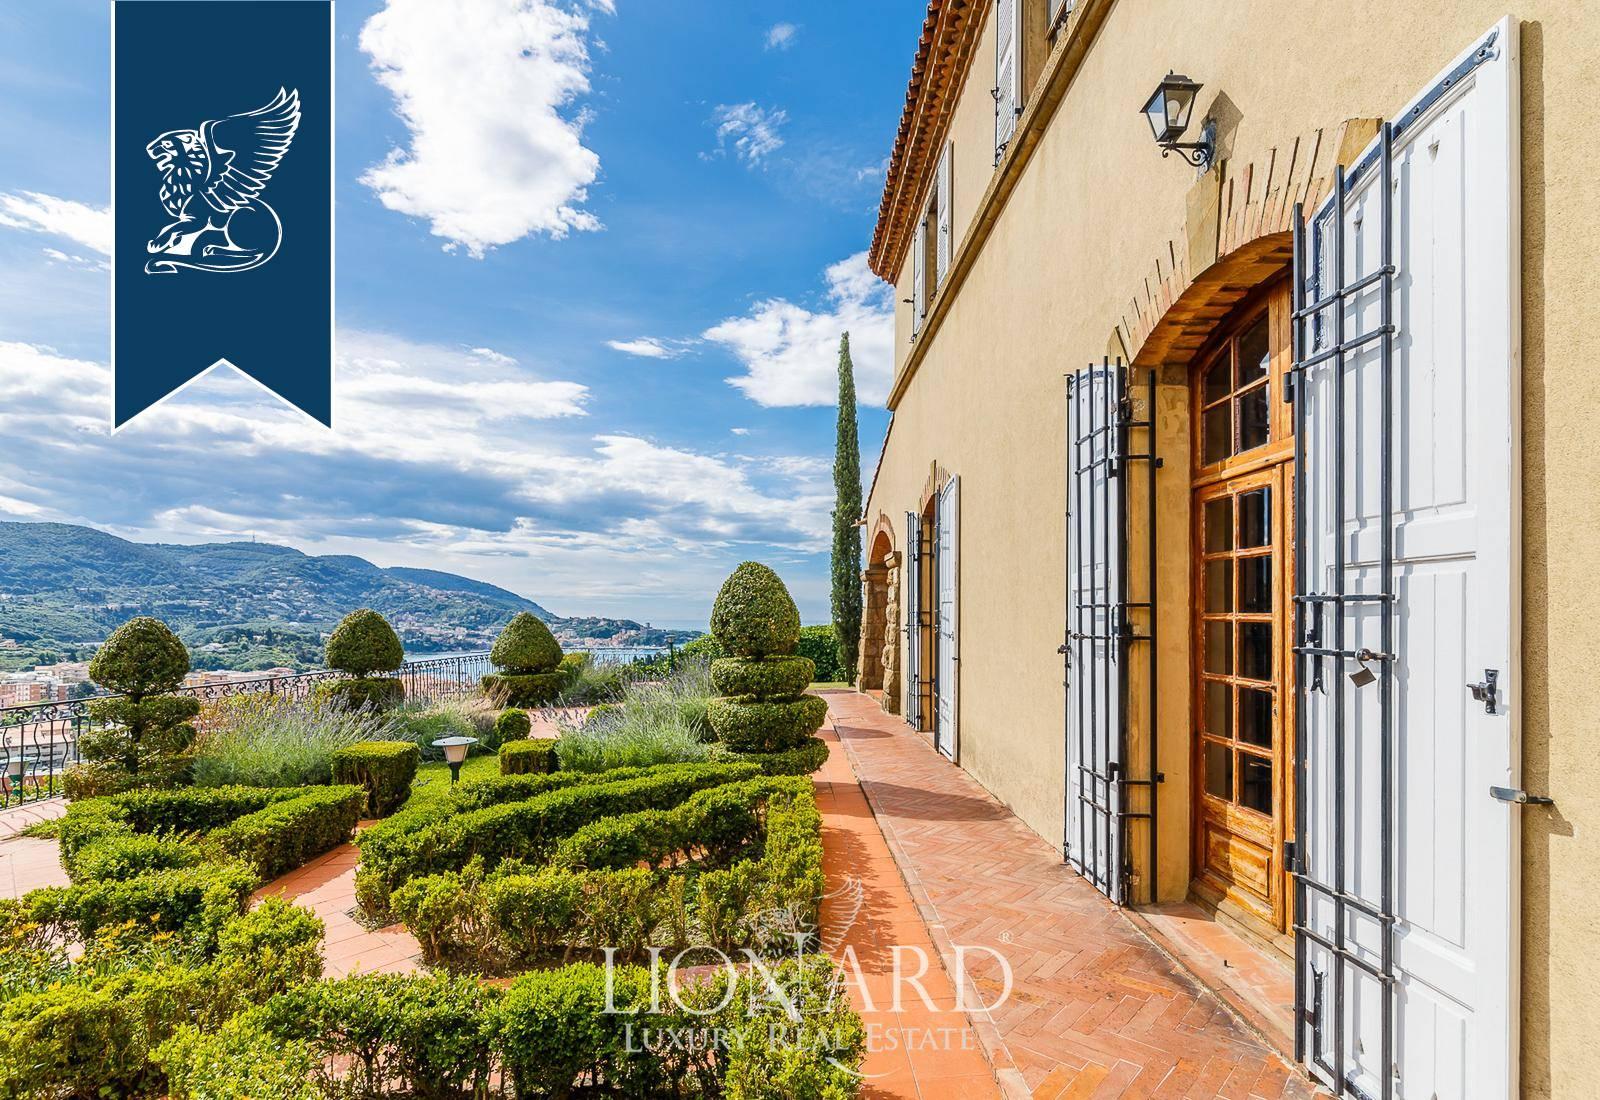 Villa in Vendita a Lerici: 0 locali, 620 mq - Foto 5